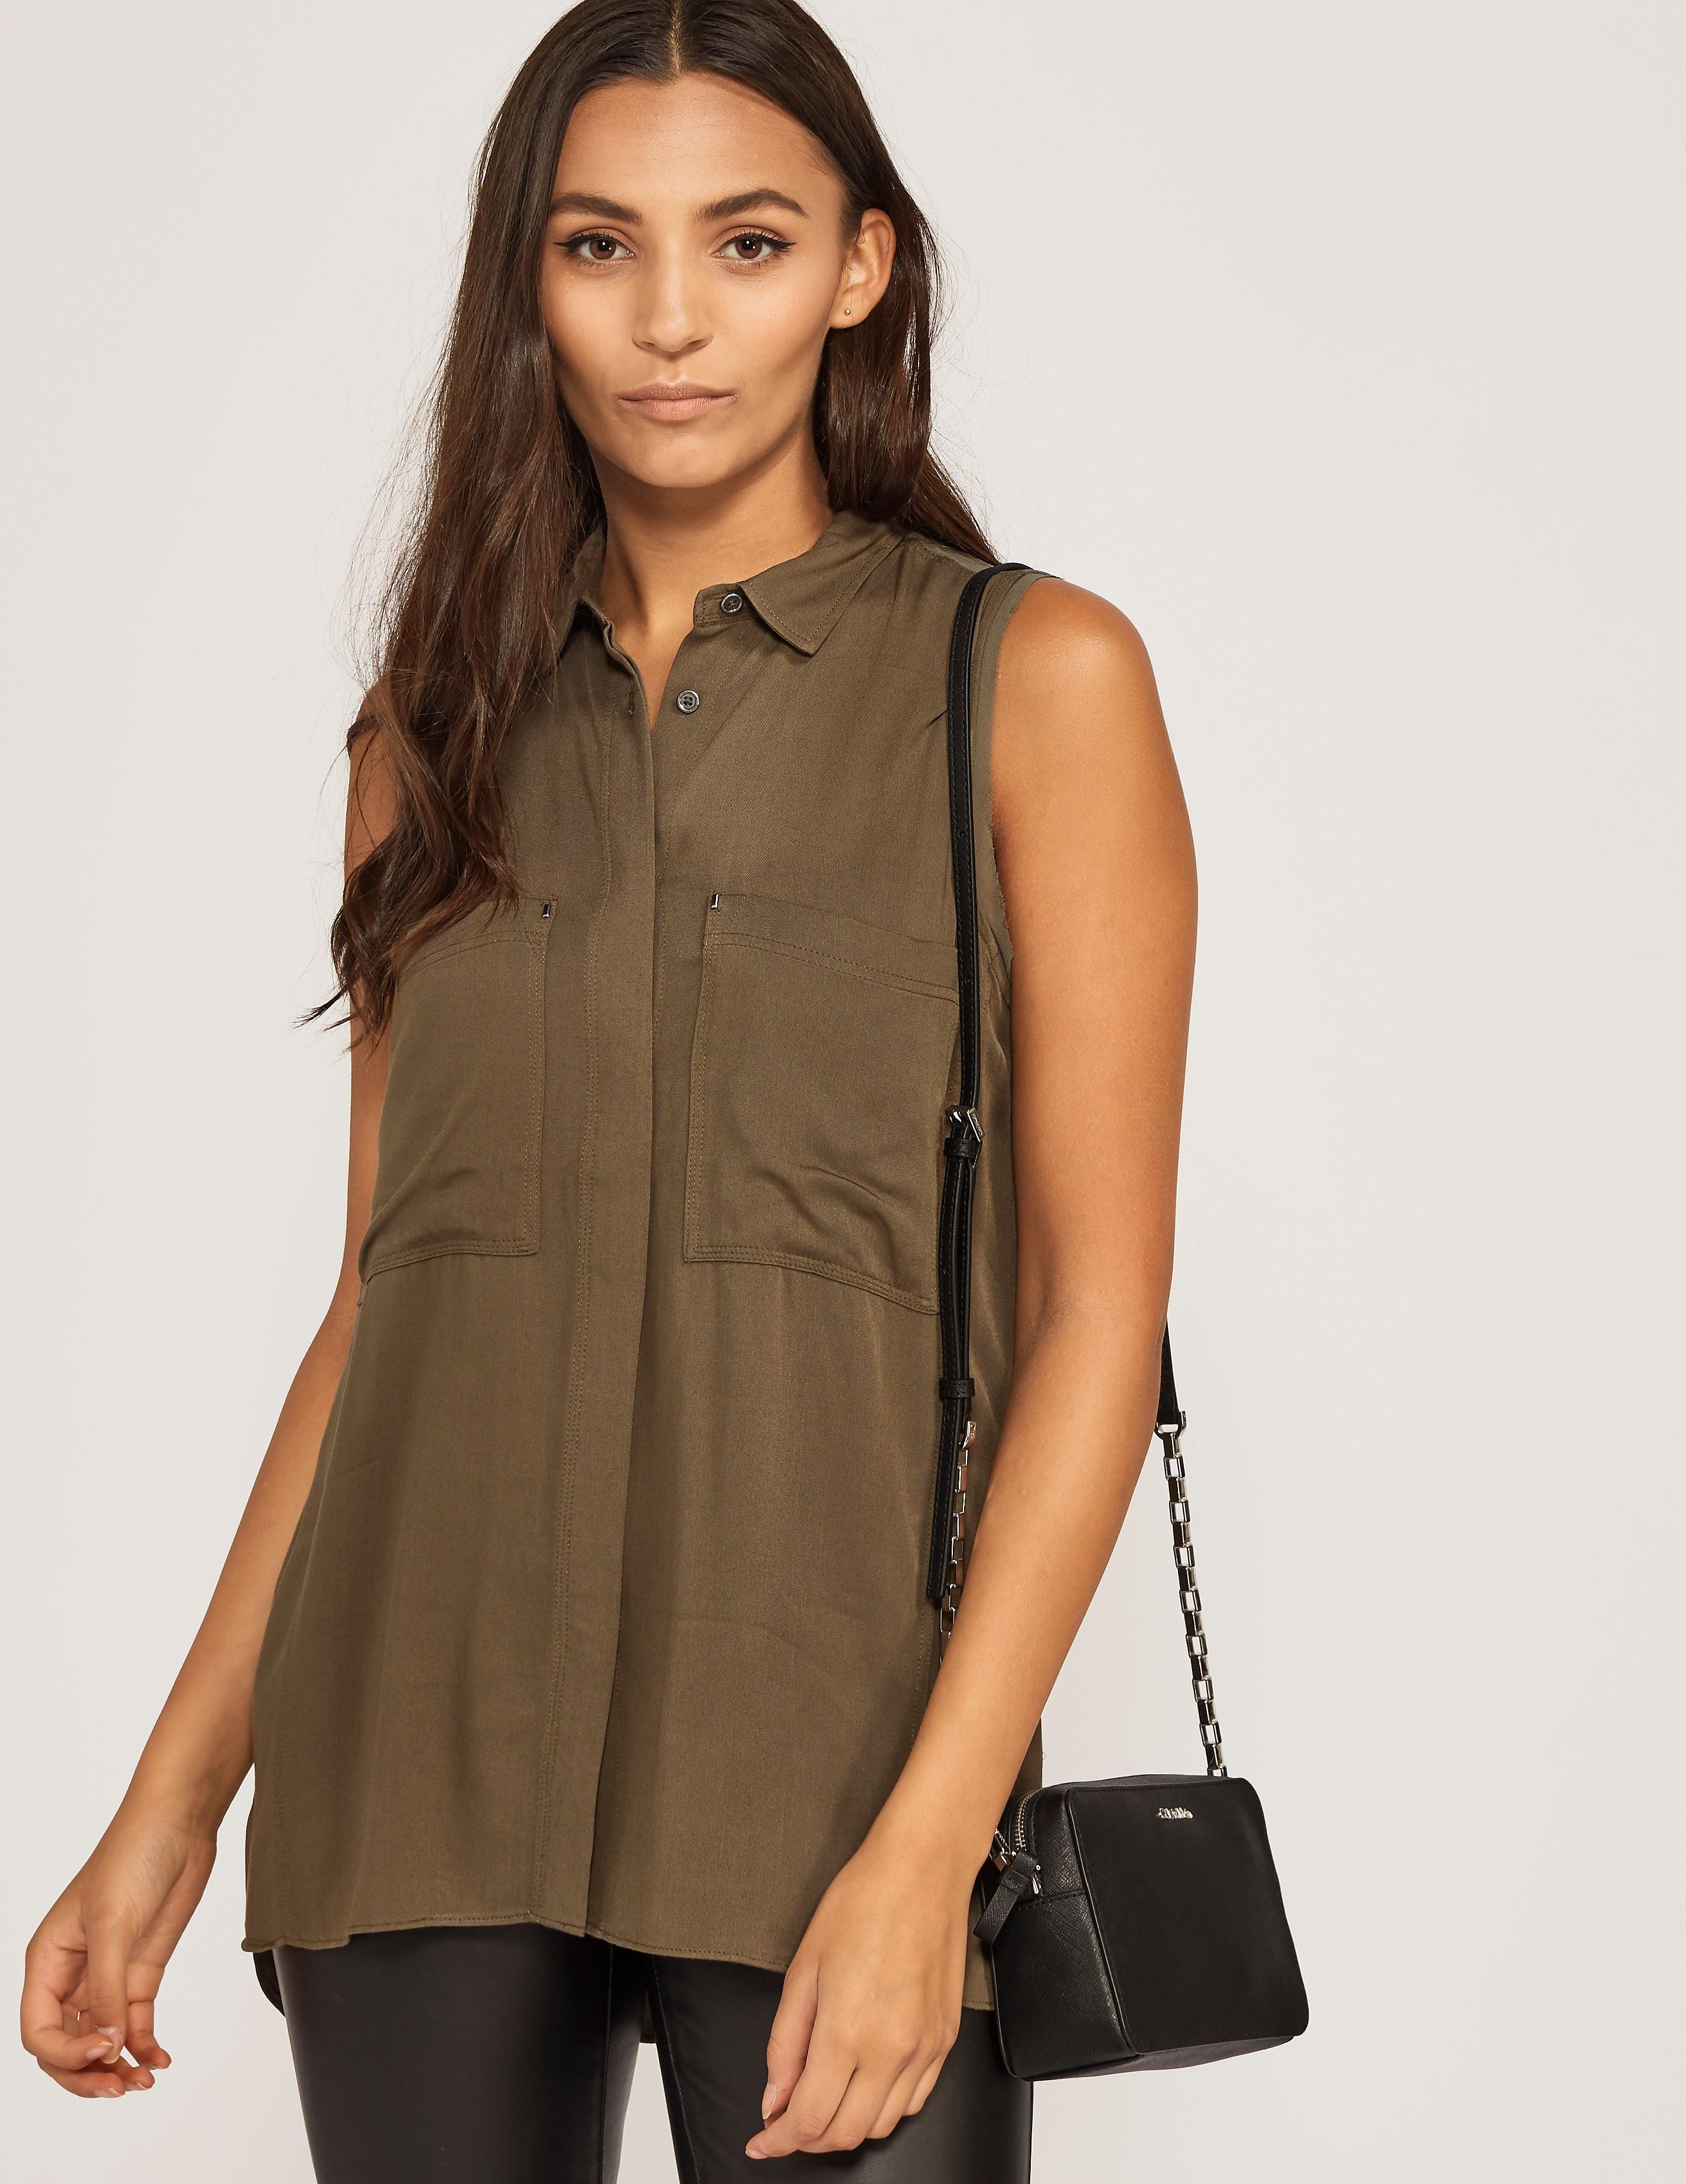 Calvin Klein Eve Sleevless Shirt